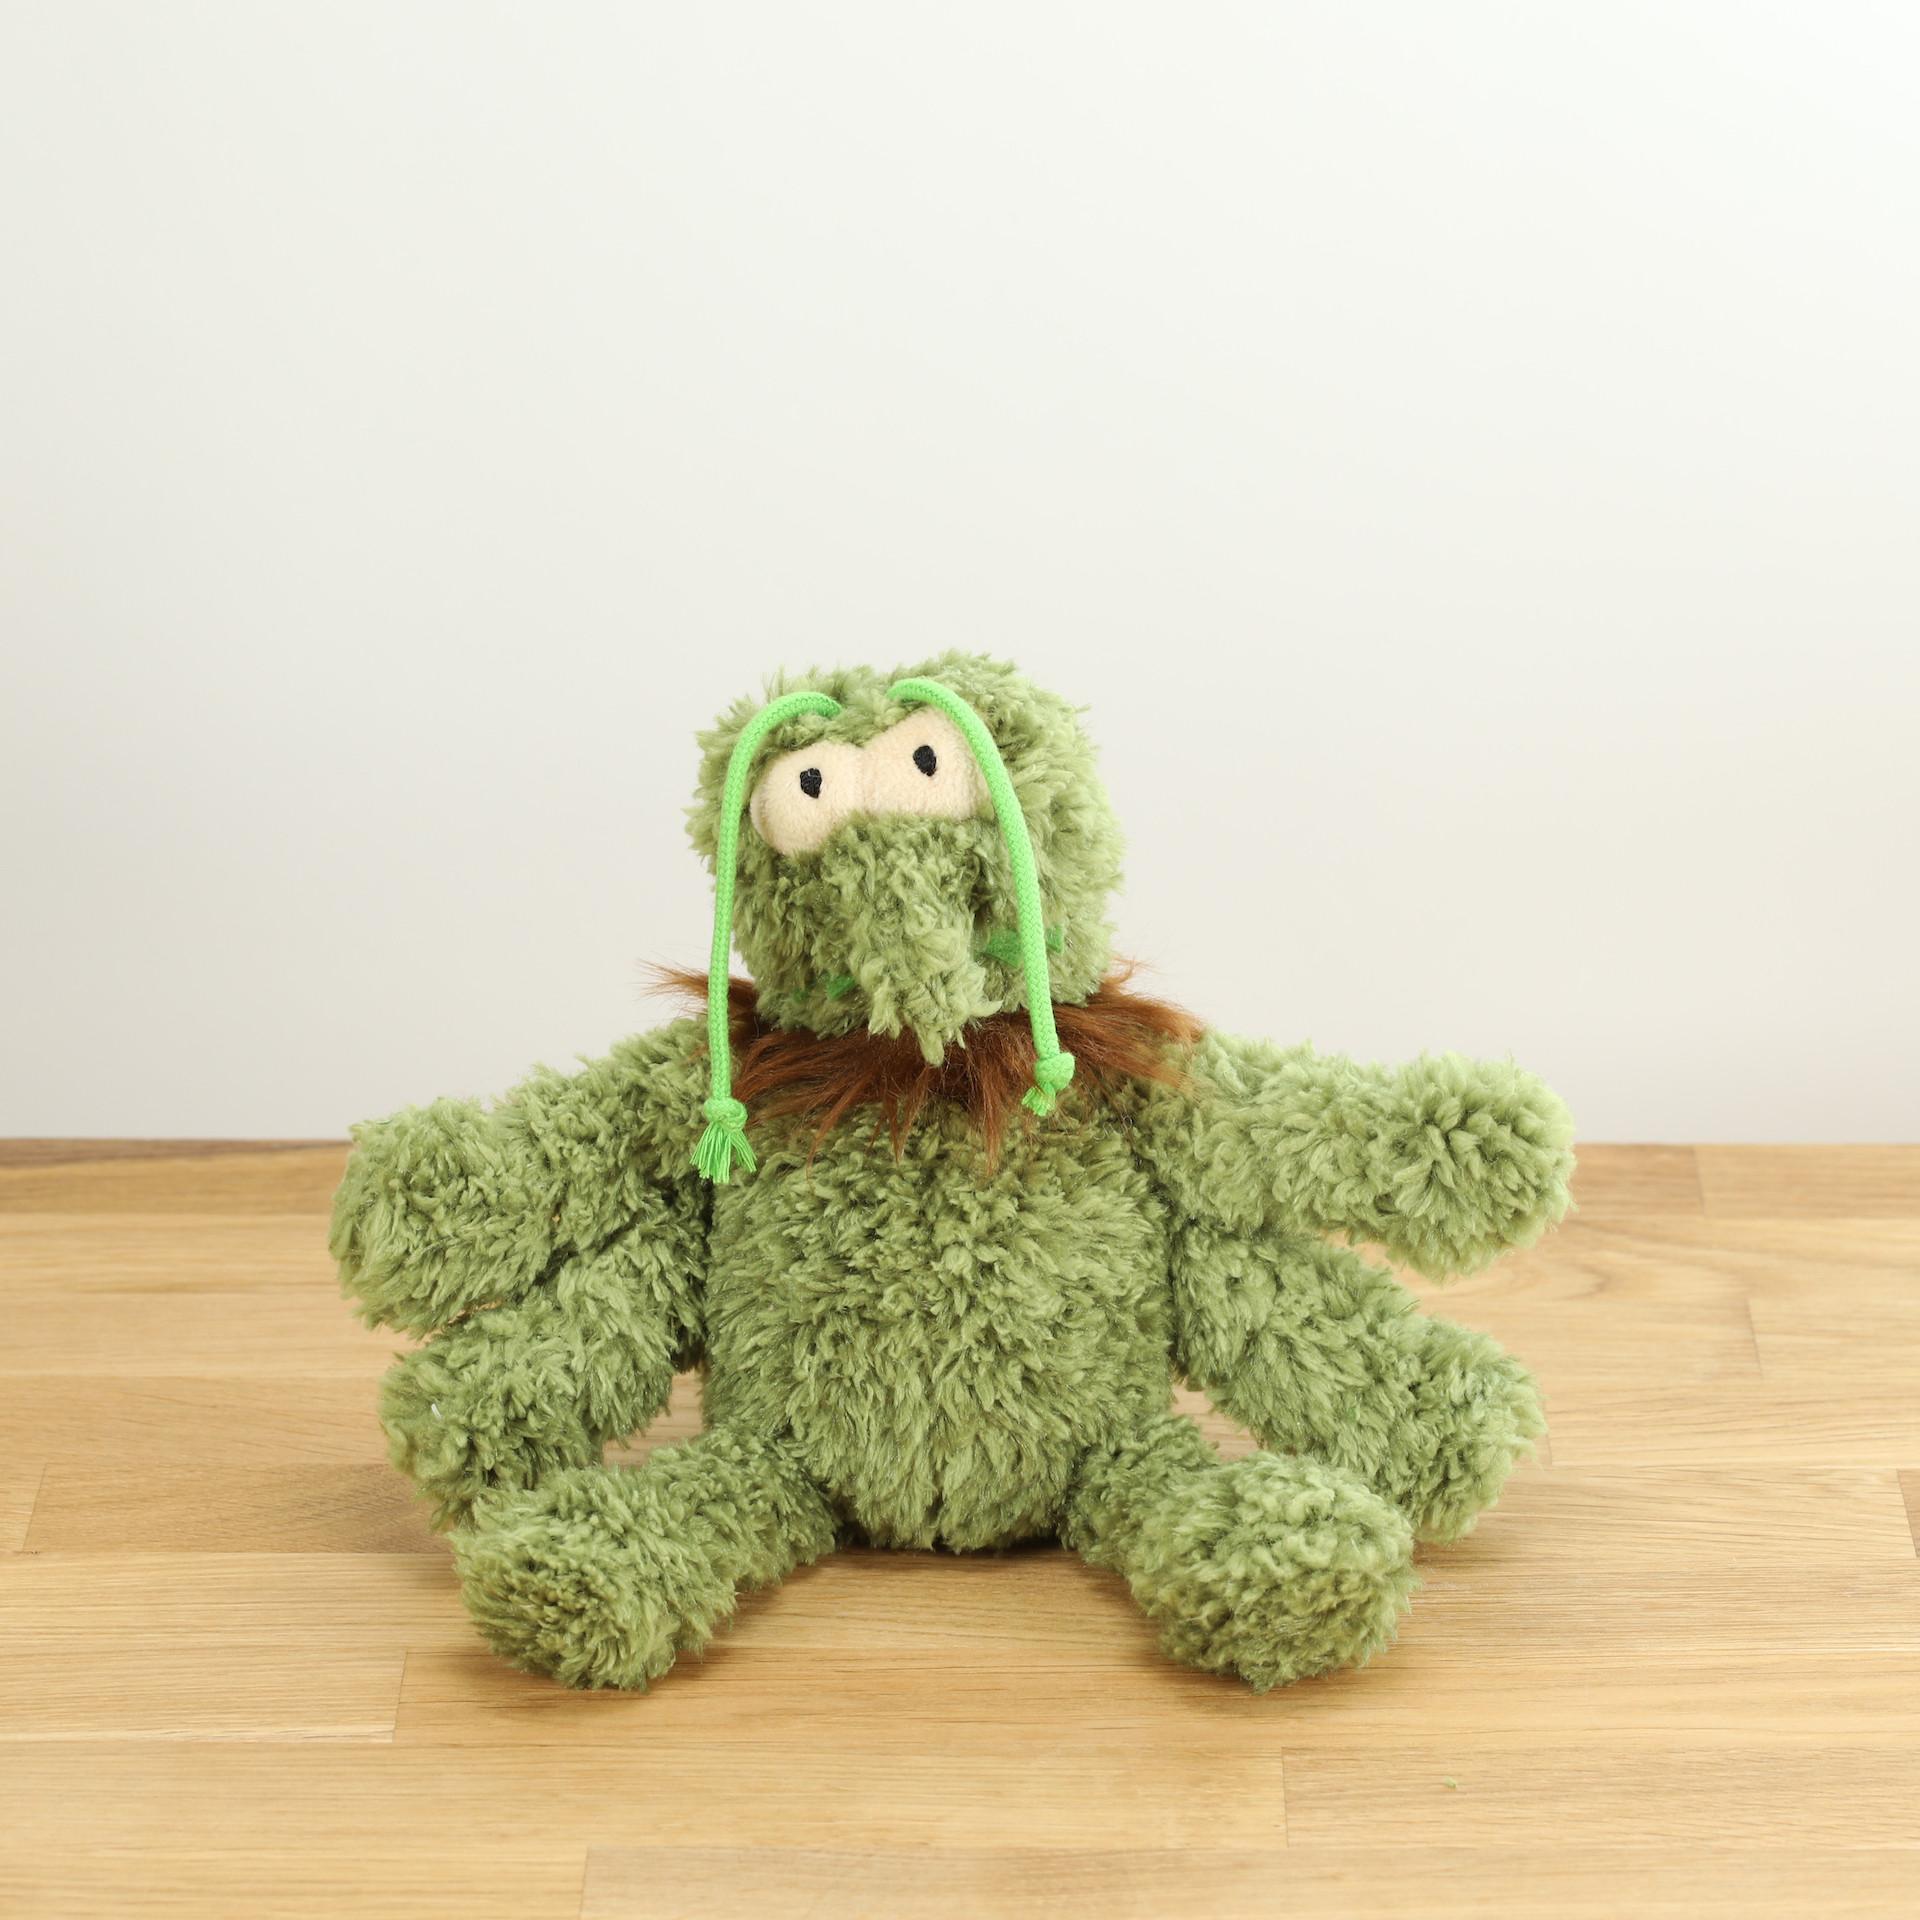 Hundespielzeug Scratchy, der grüne Floh